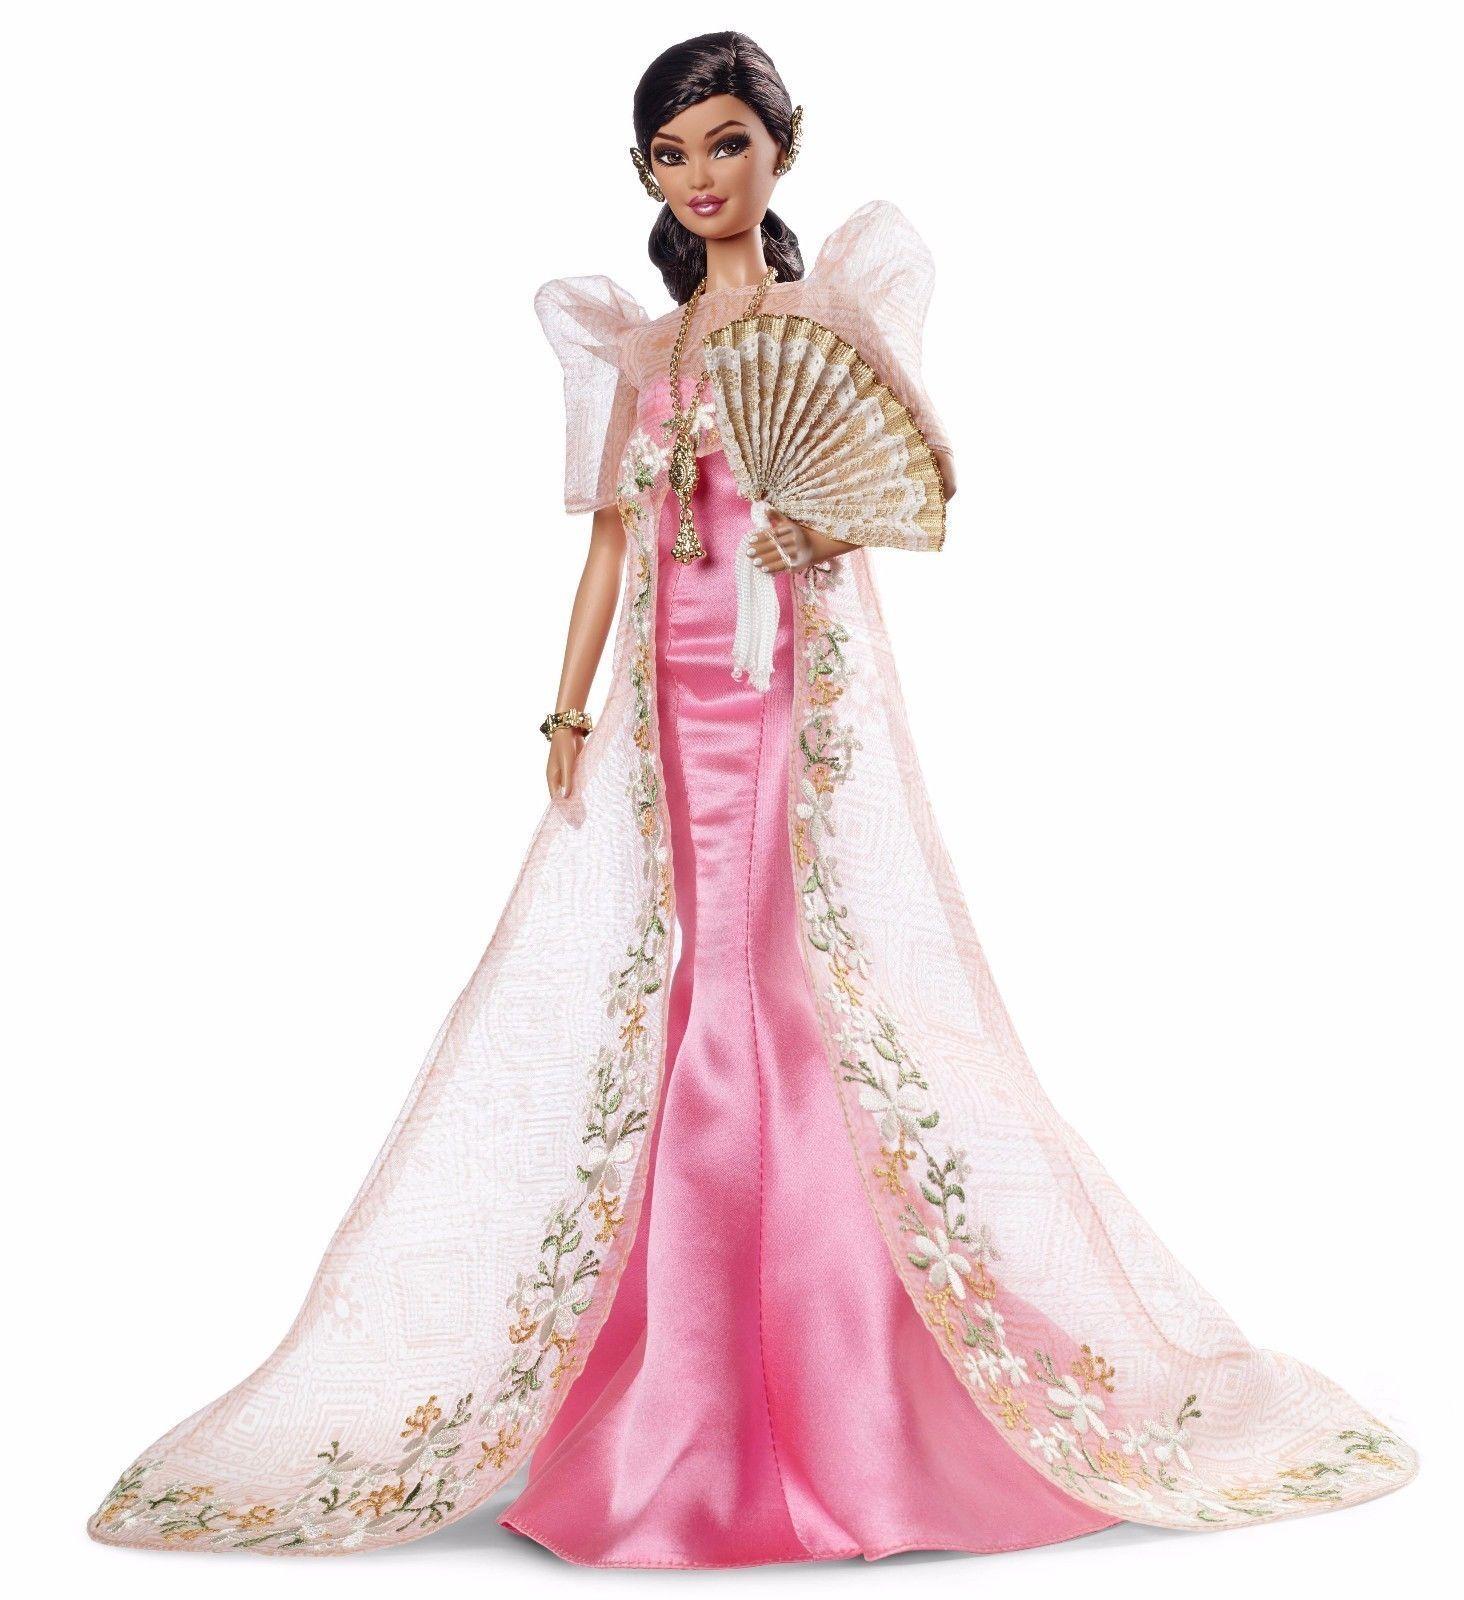 Global Glamour Muñeca Barbie Filipinas asain Mutya CGT76 Nuevo en caja de remitente